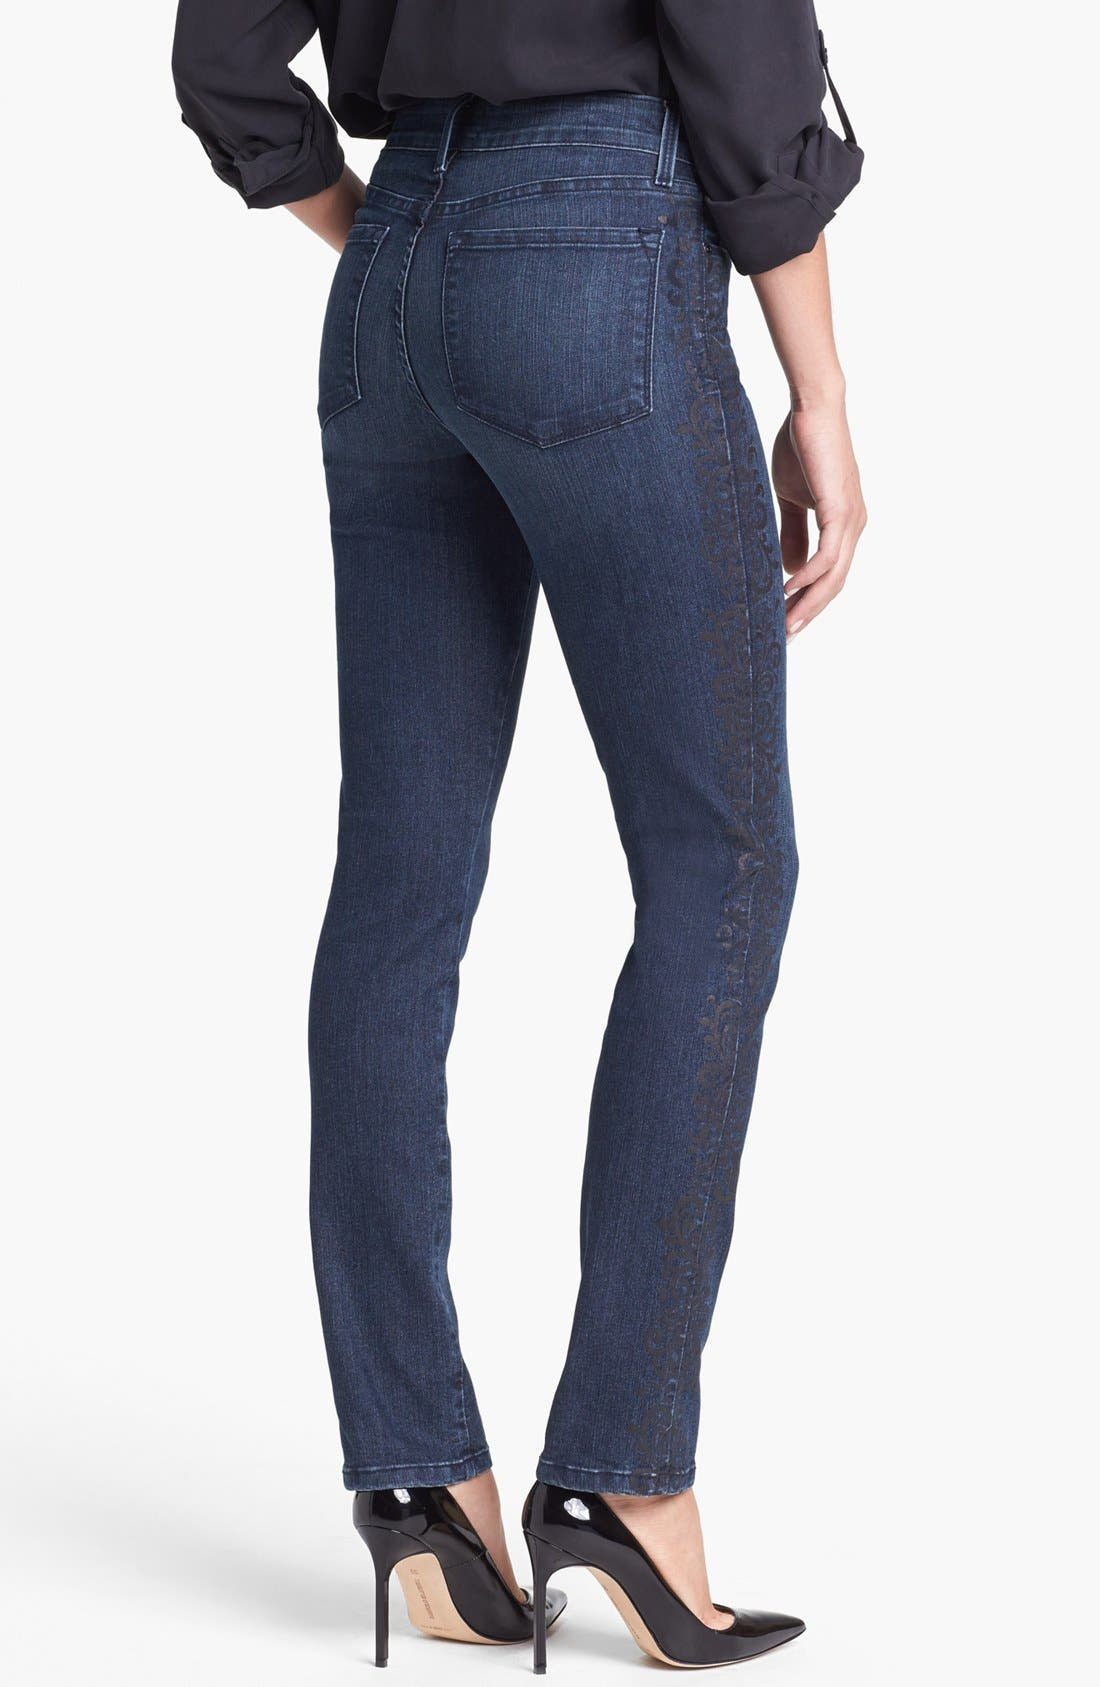 Alternate Image 3  - NYDJ 'Sheri' Lace Detail Stretch Skinny Stretch Jeans (Old River)